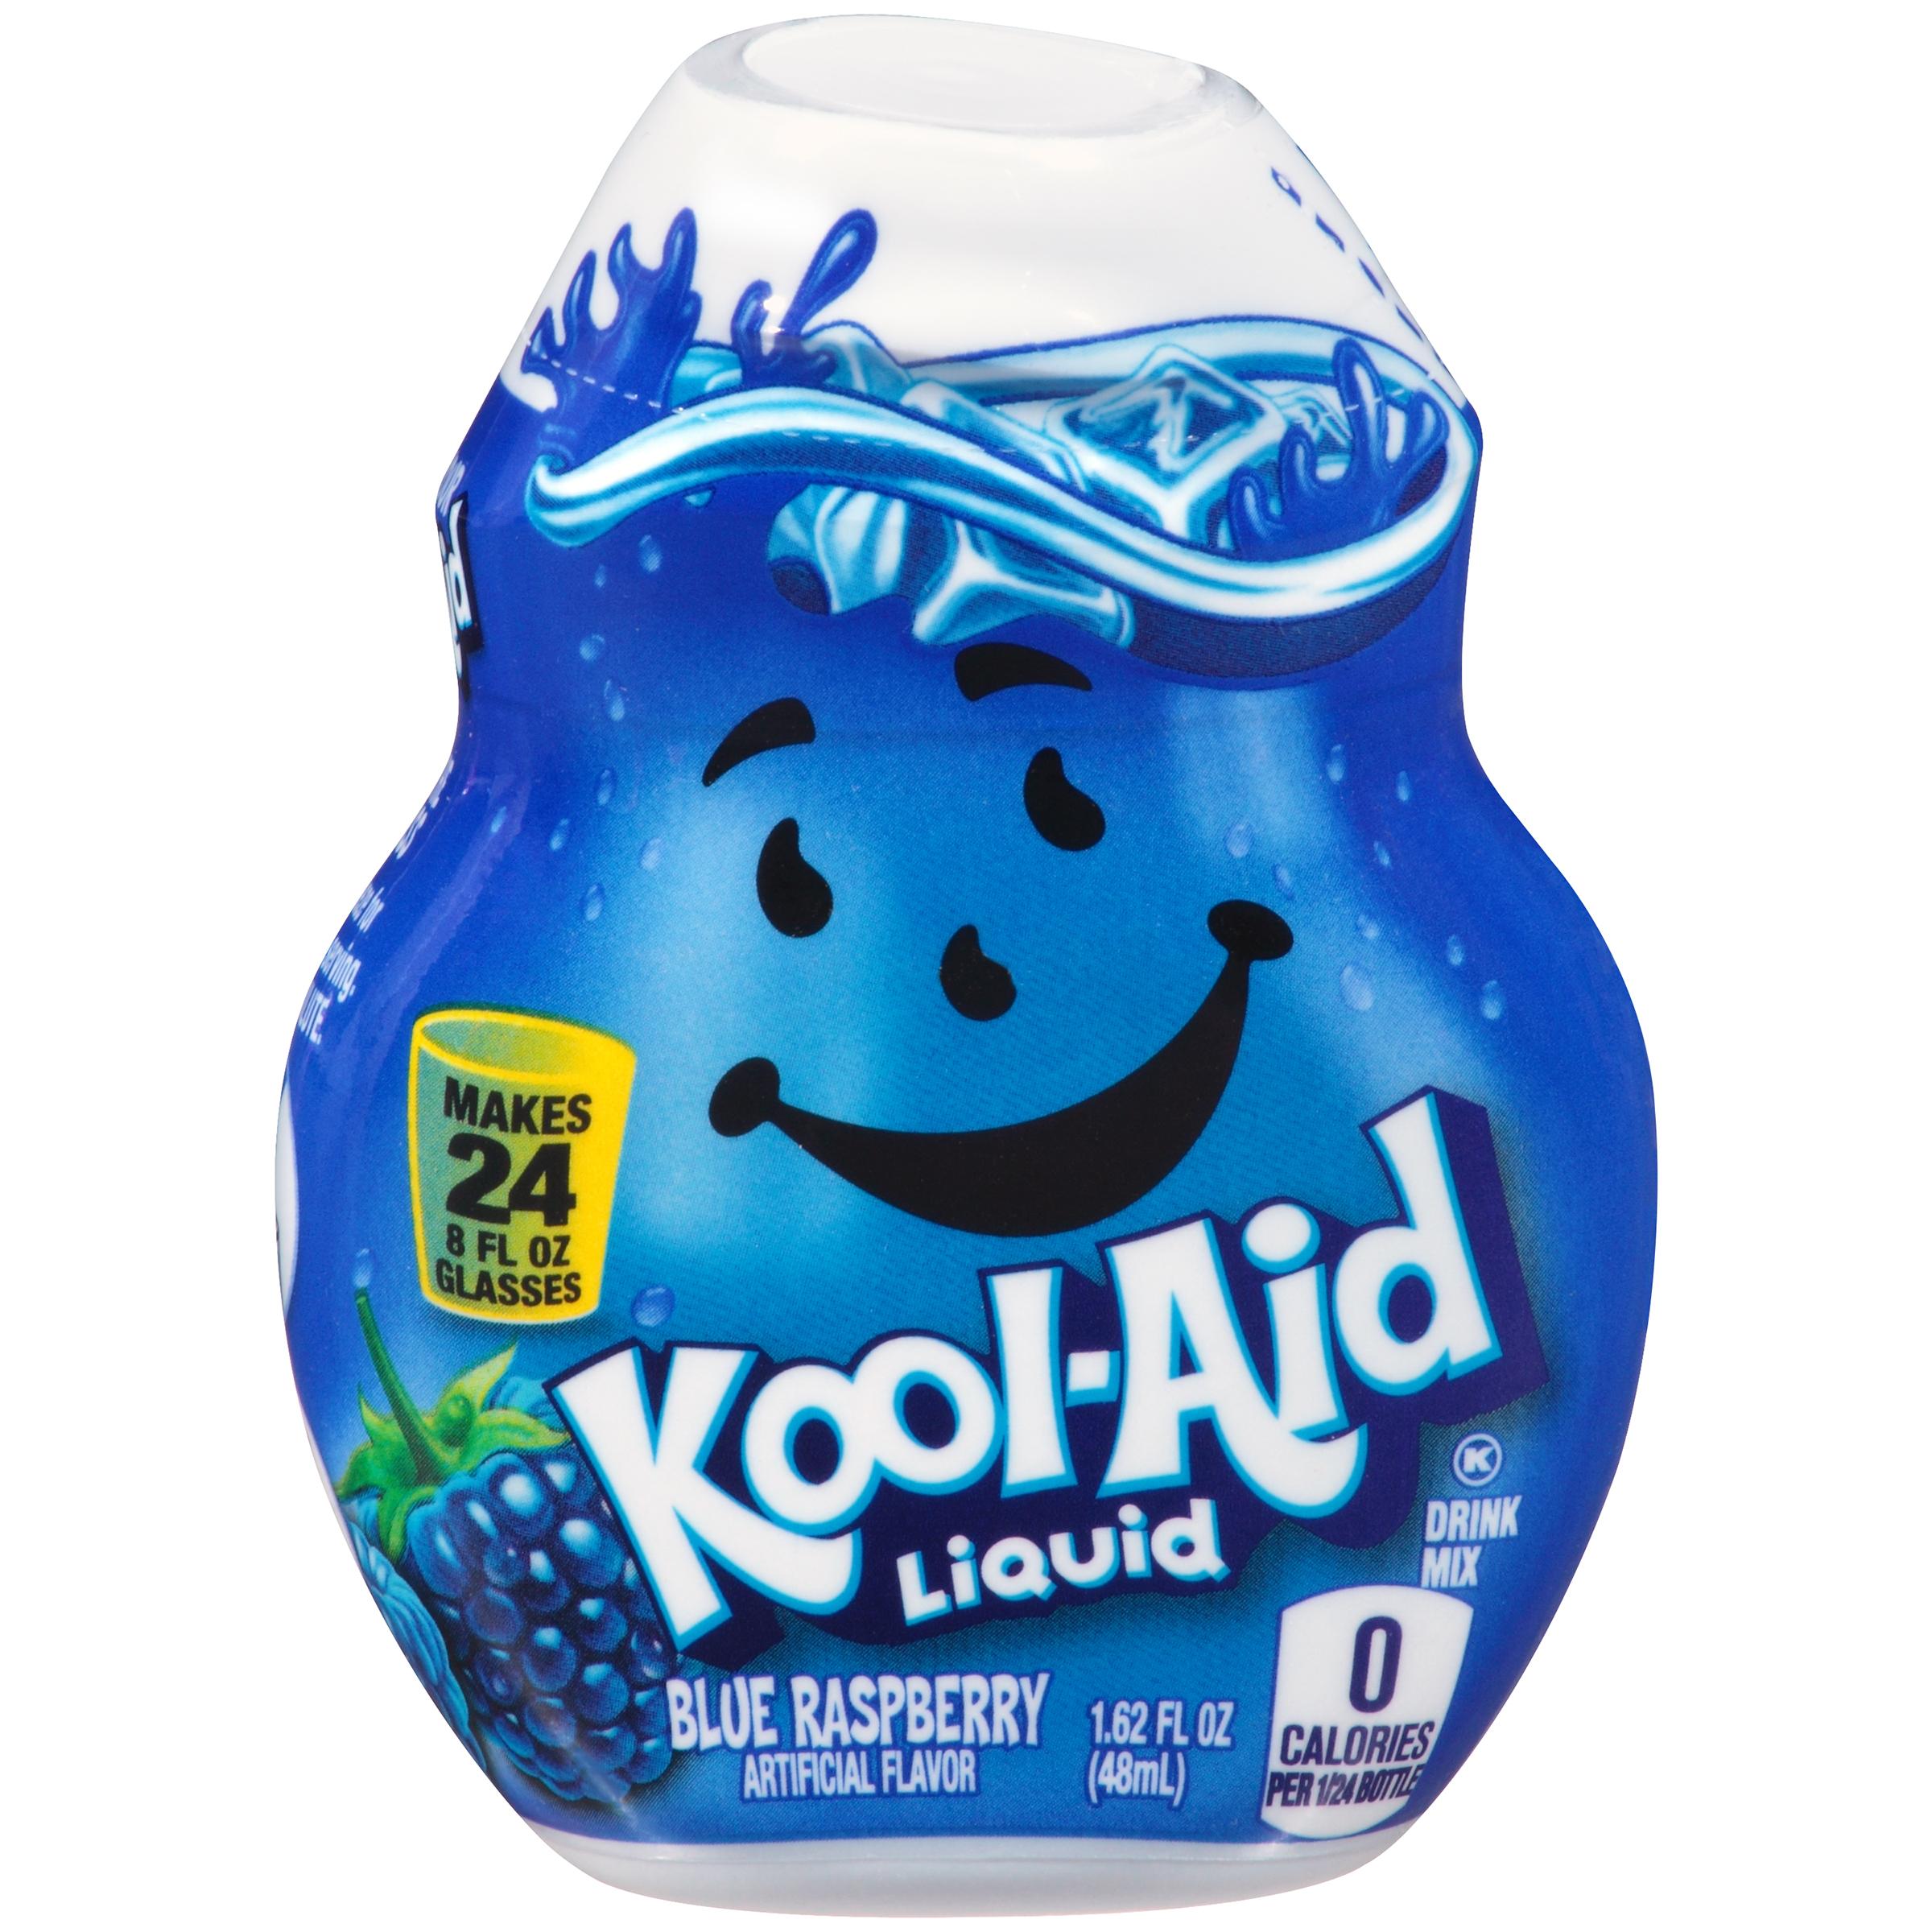 KOOL-AID Blue Raspberry Liquid Drink Mix 1.62 fl oz Bottle image